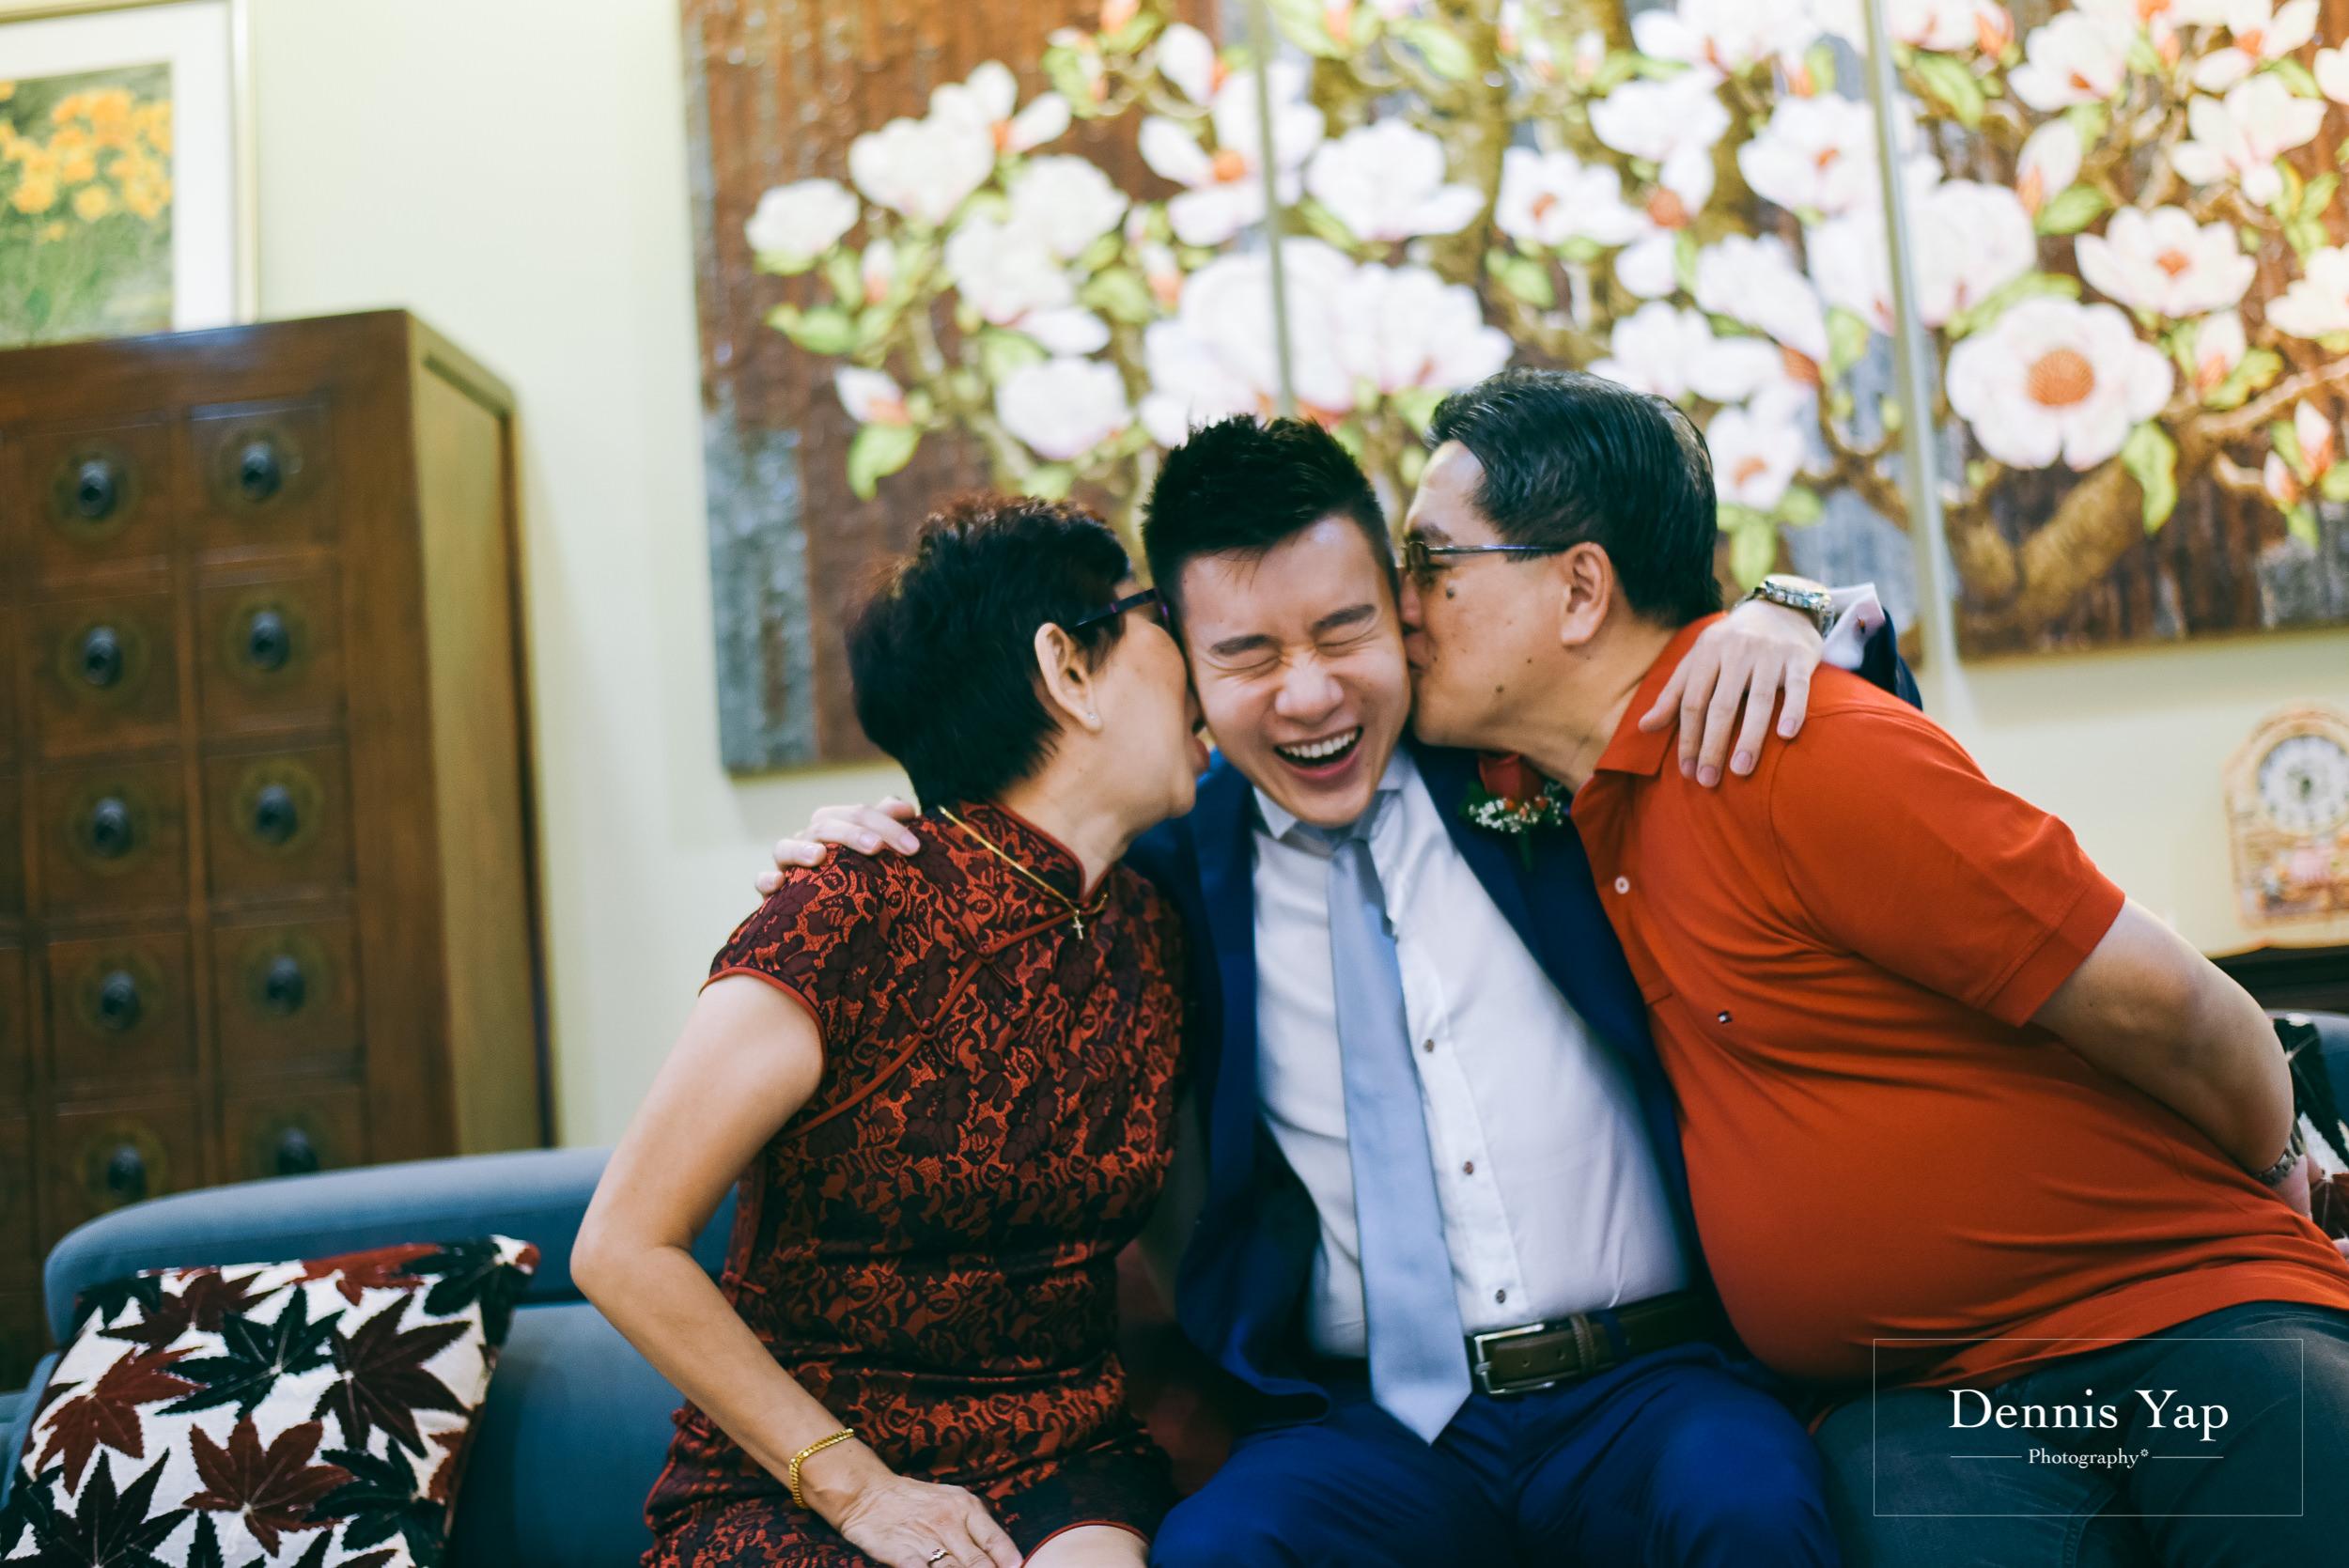 ethan juli wedding day gate crash wedding party dennis yap photography colors-20.jpg